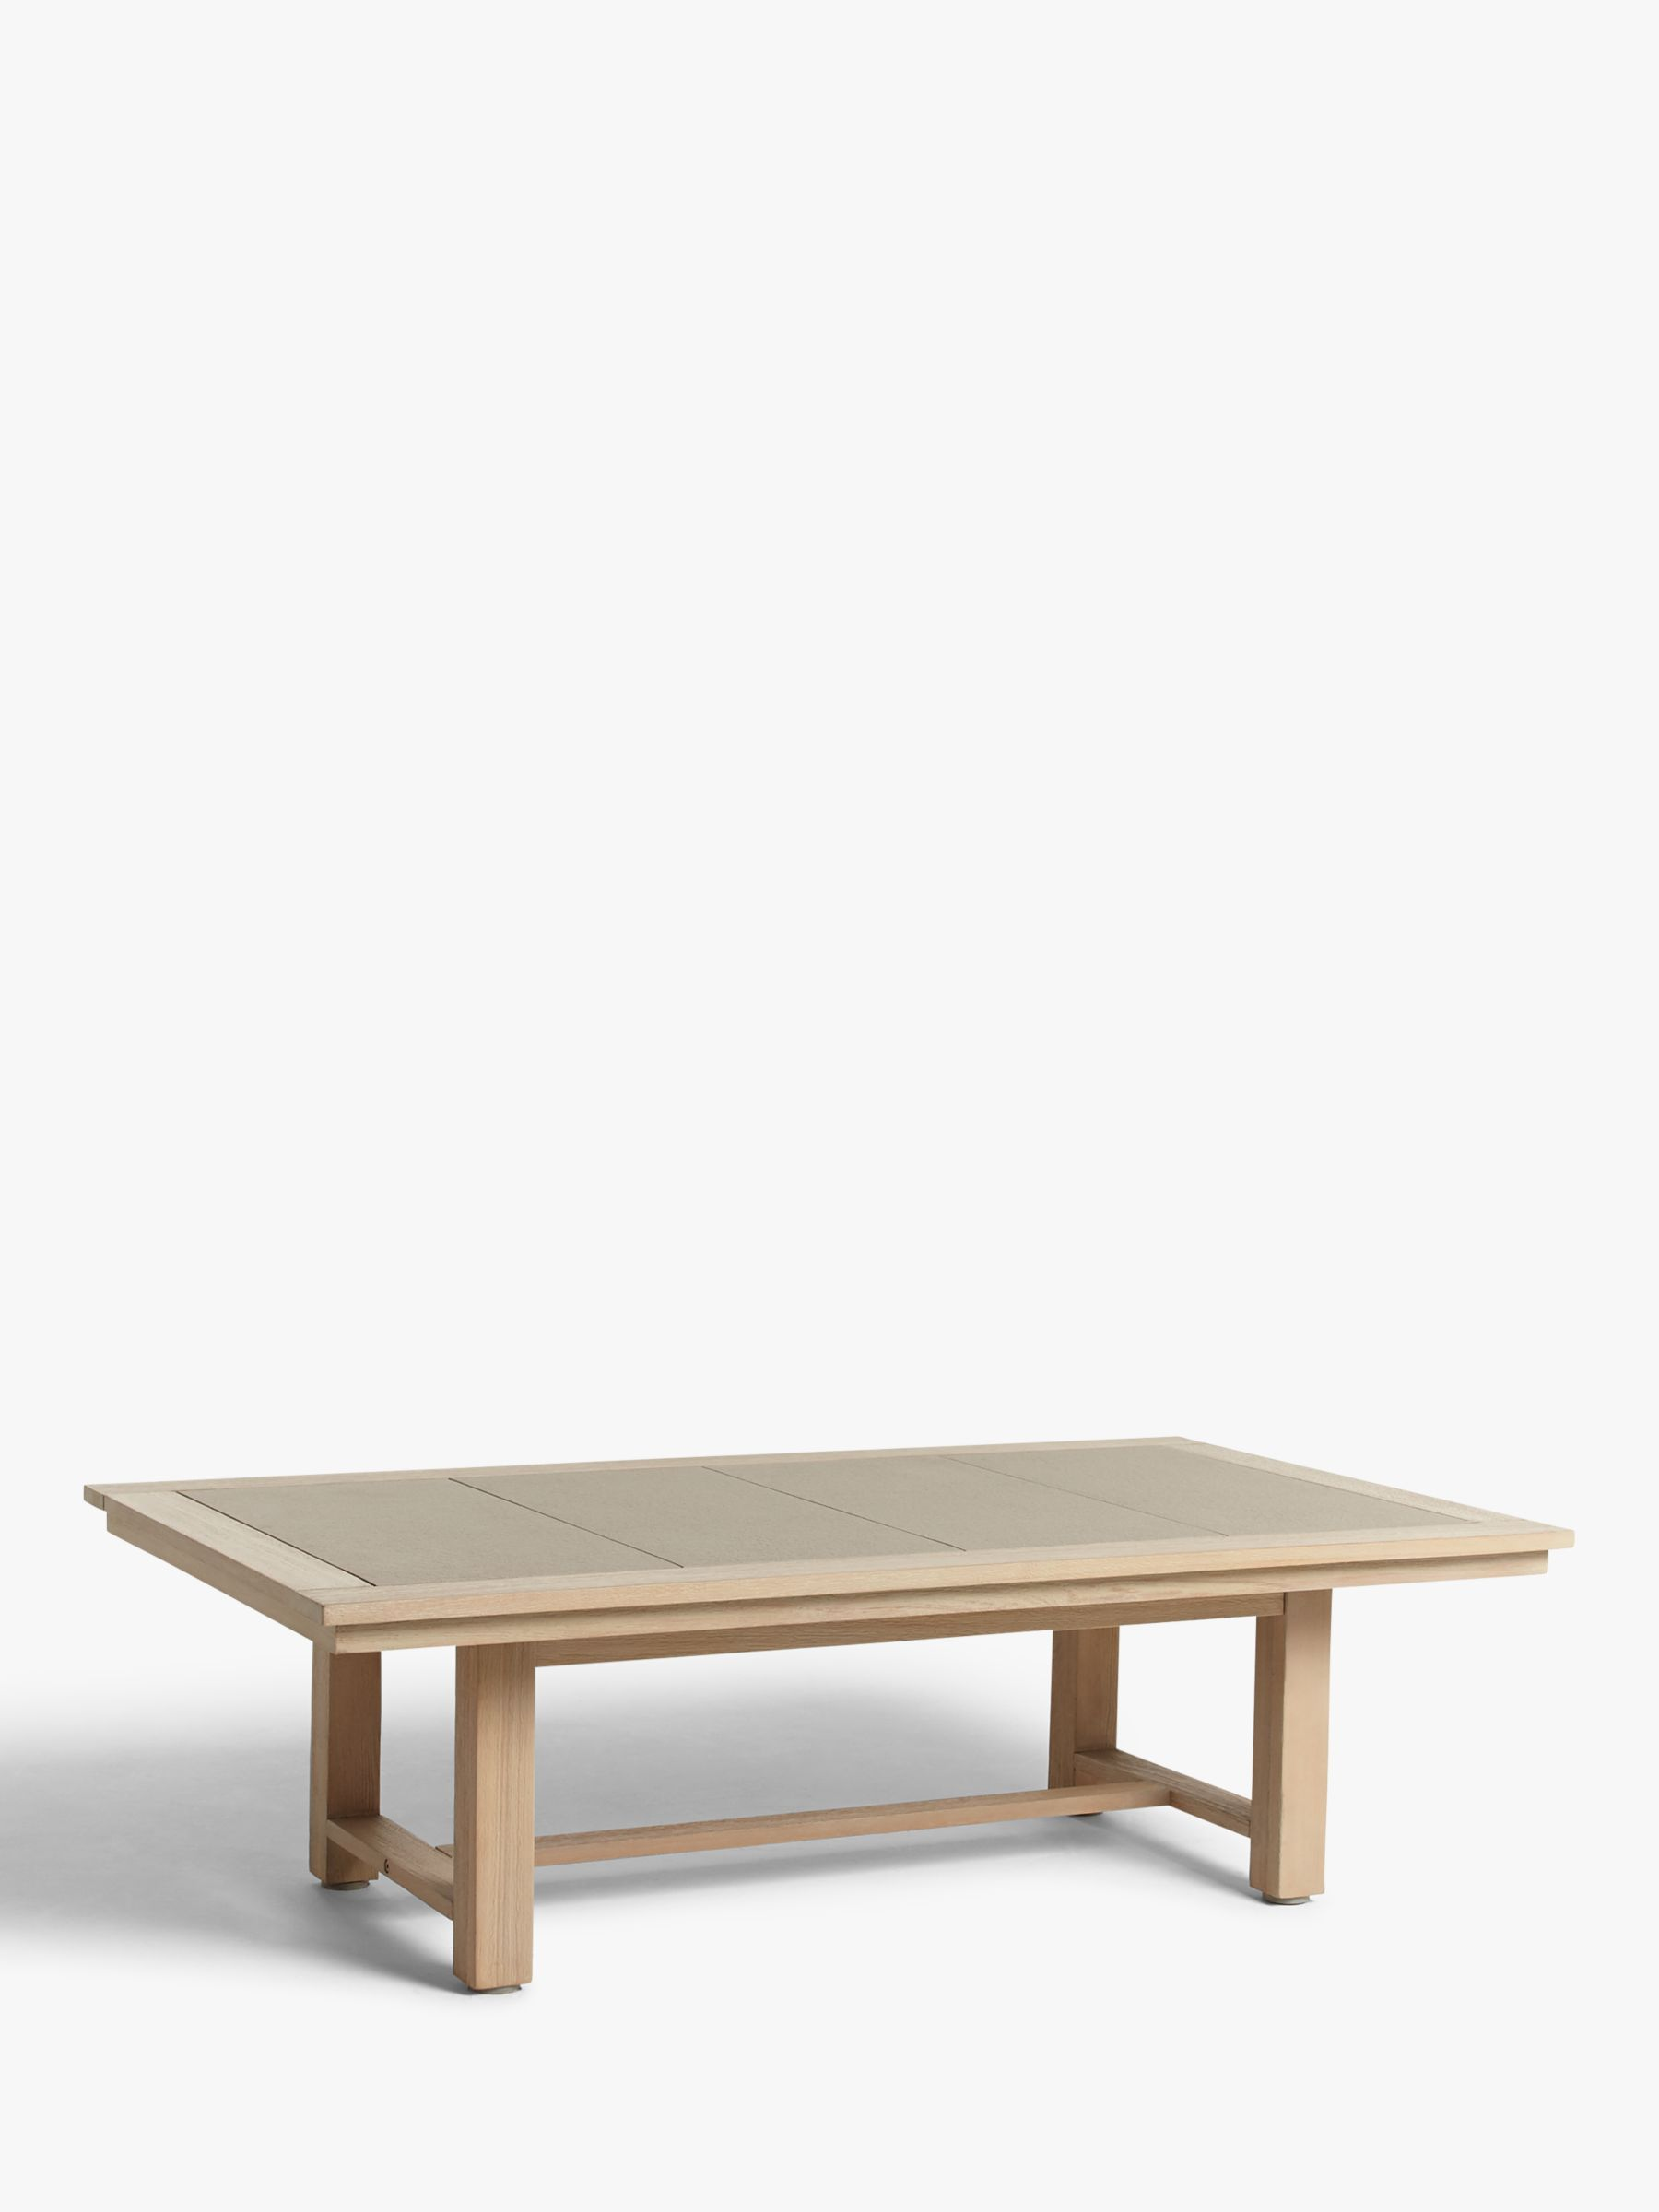 john lewis partners st ives garden coffee table fsc certified eucalyptus wood natural